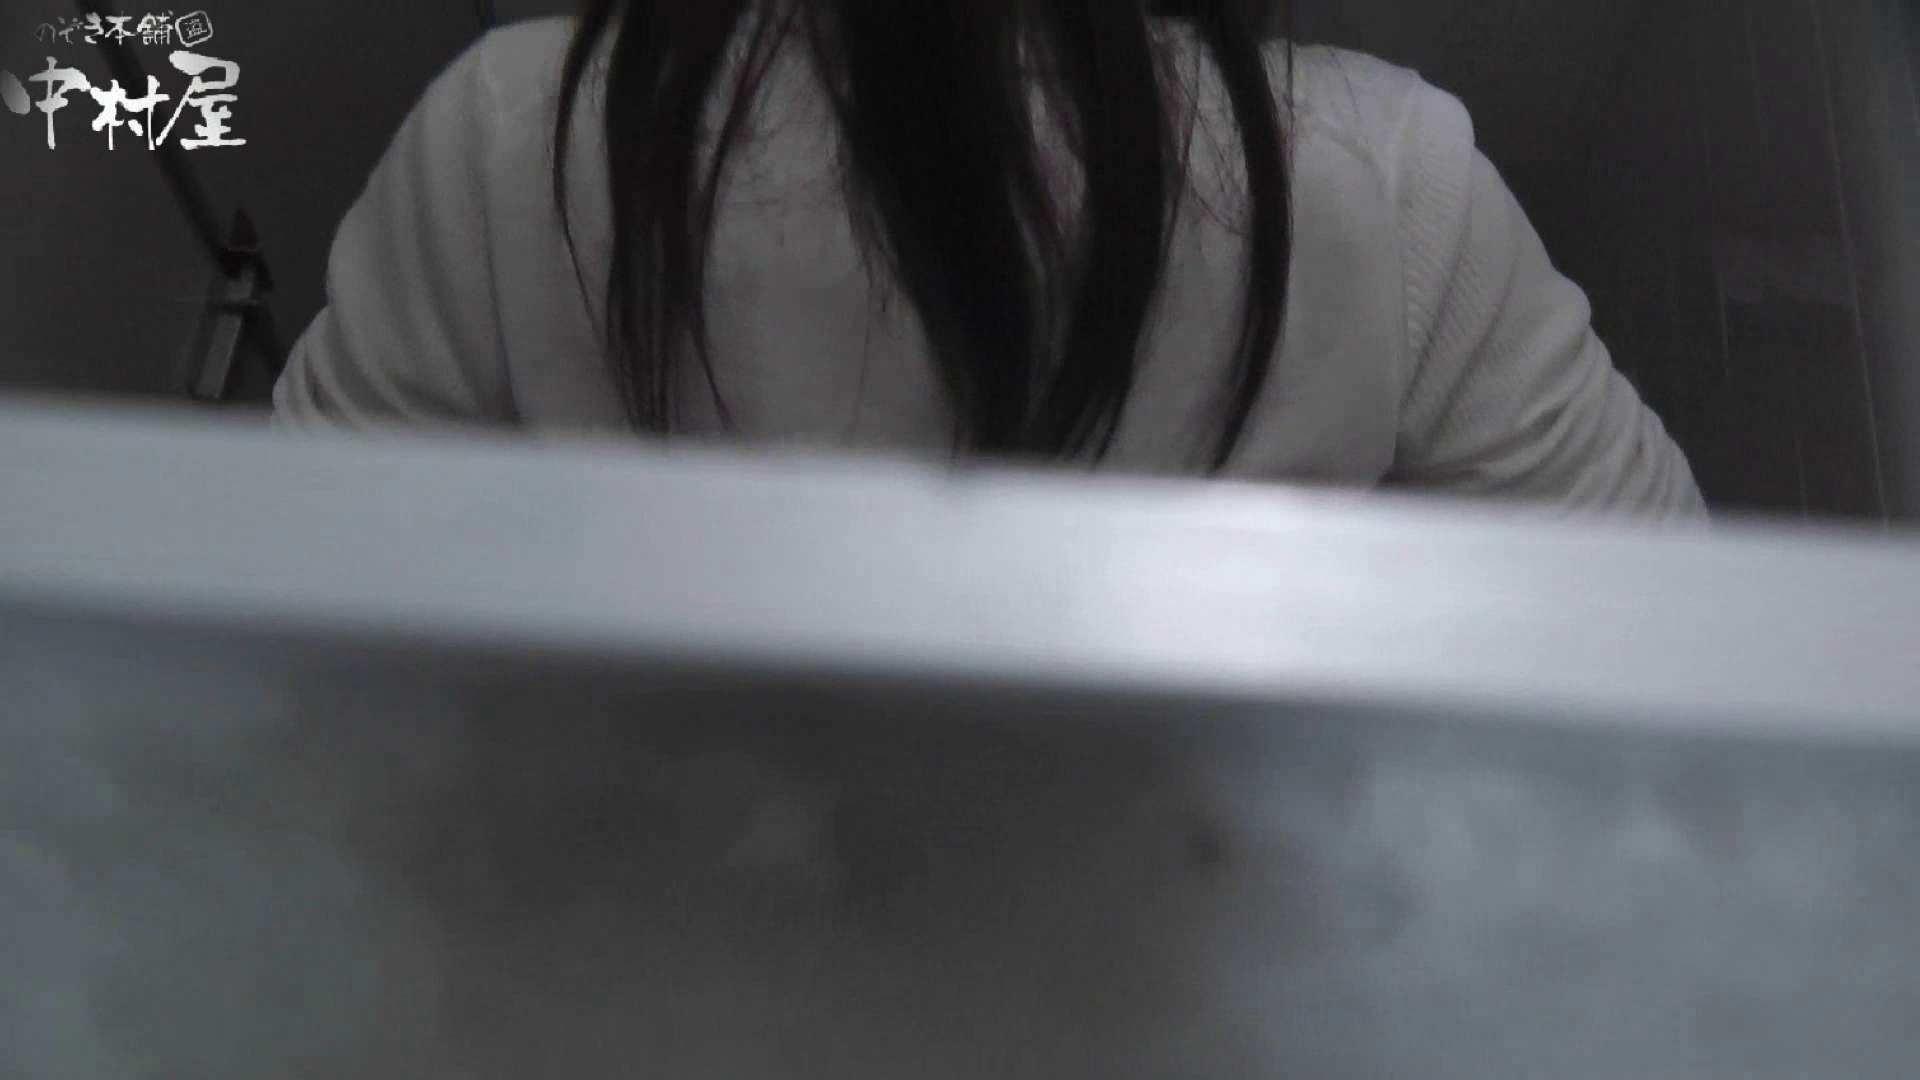 vol.34 命がけ潜伏洗面所! アソコの毛が長髪な件 プライベート オマンコ無修正動画無料 97PIX 20